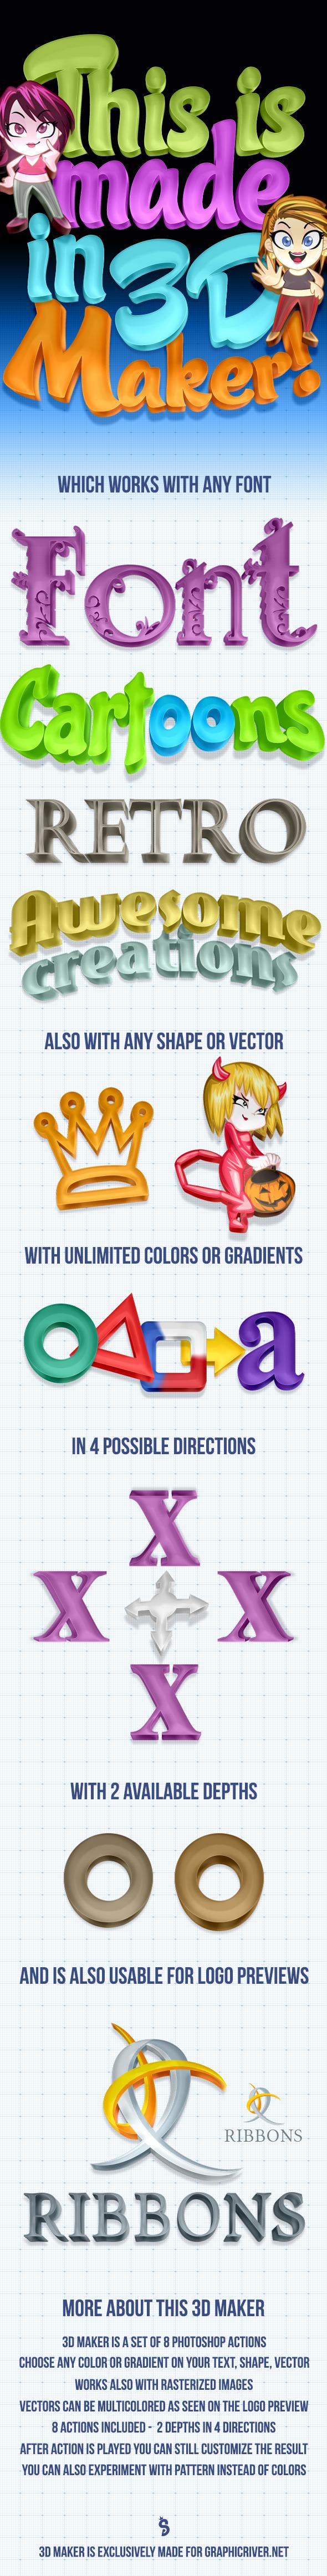 Colorful 3D Maker - Actions Photoshop